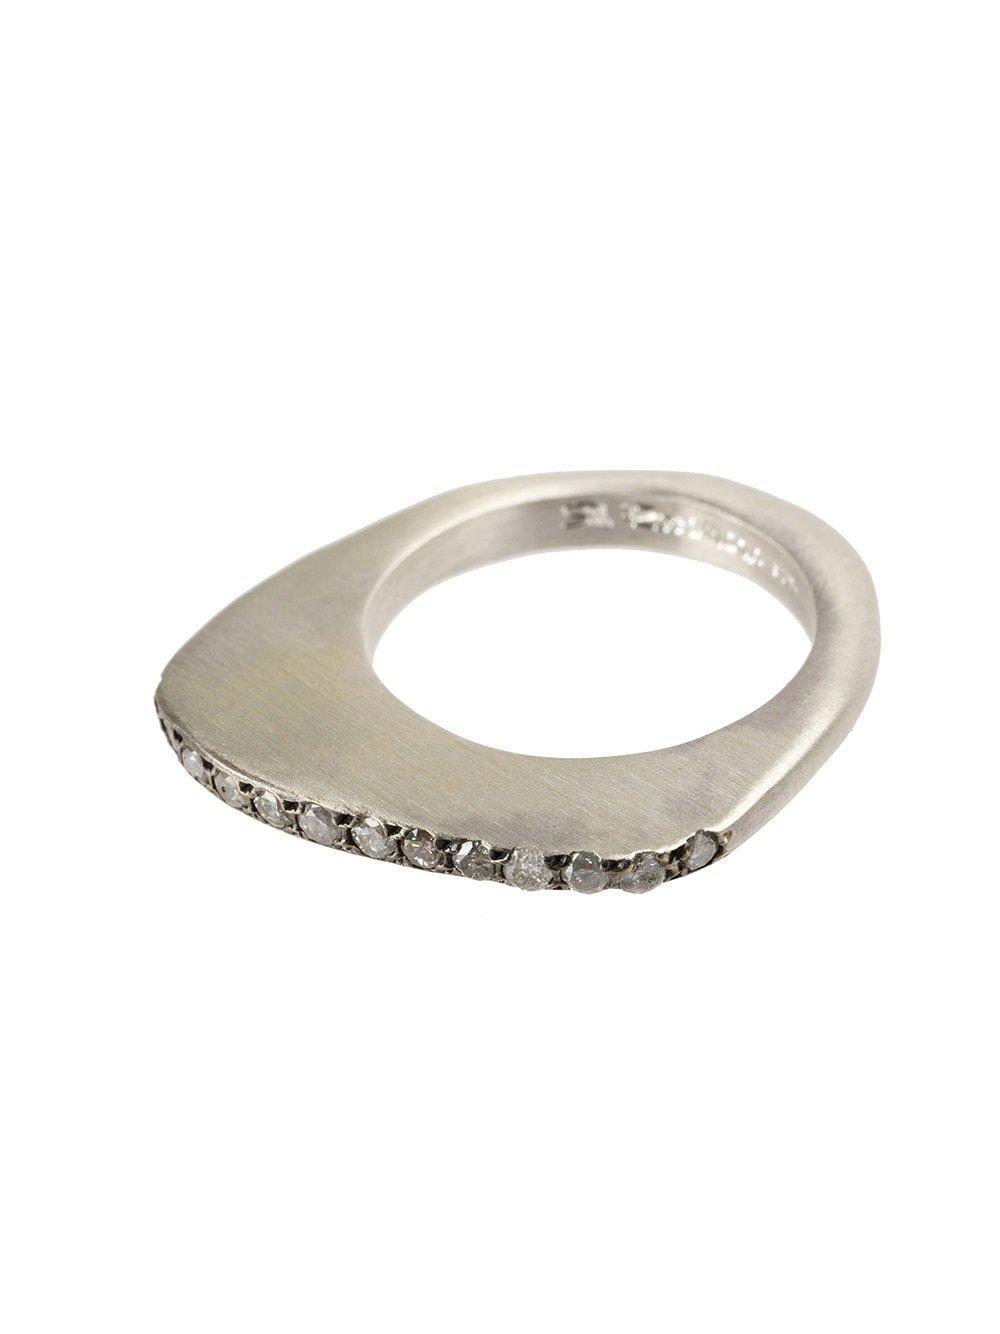 Rosa Maria Studded Ring in Metallic